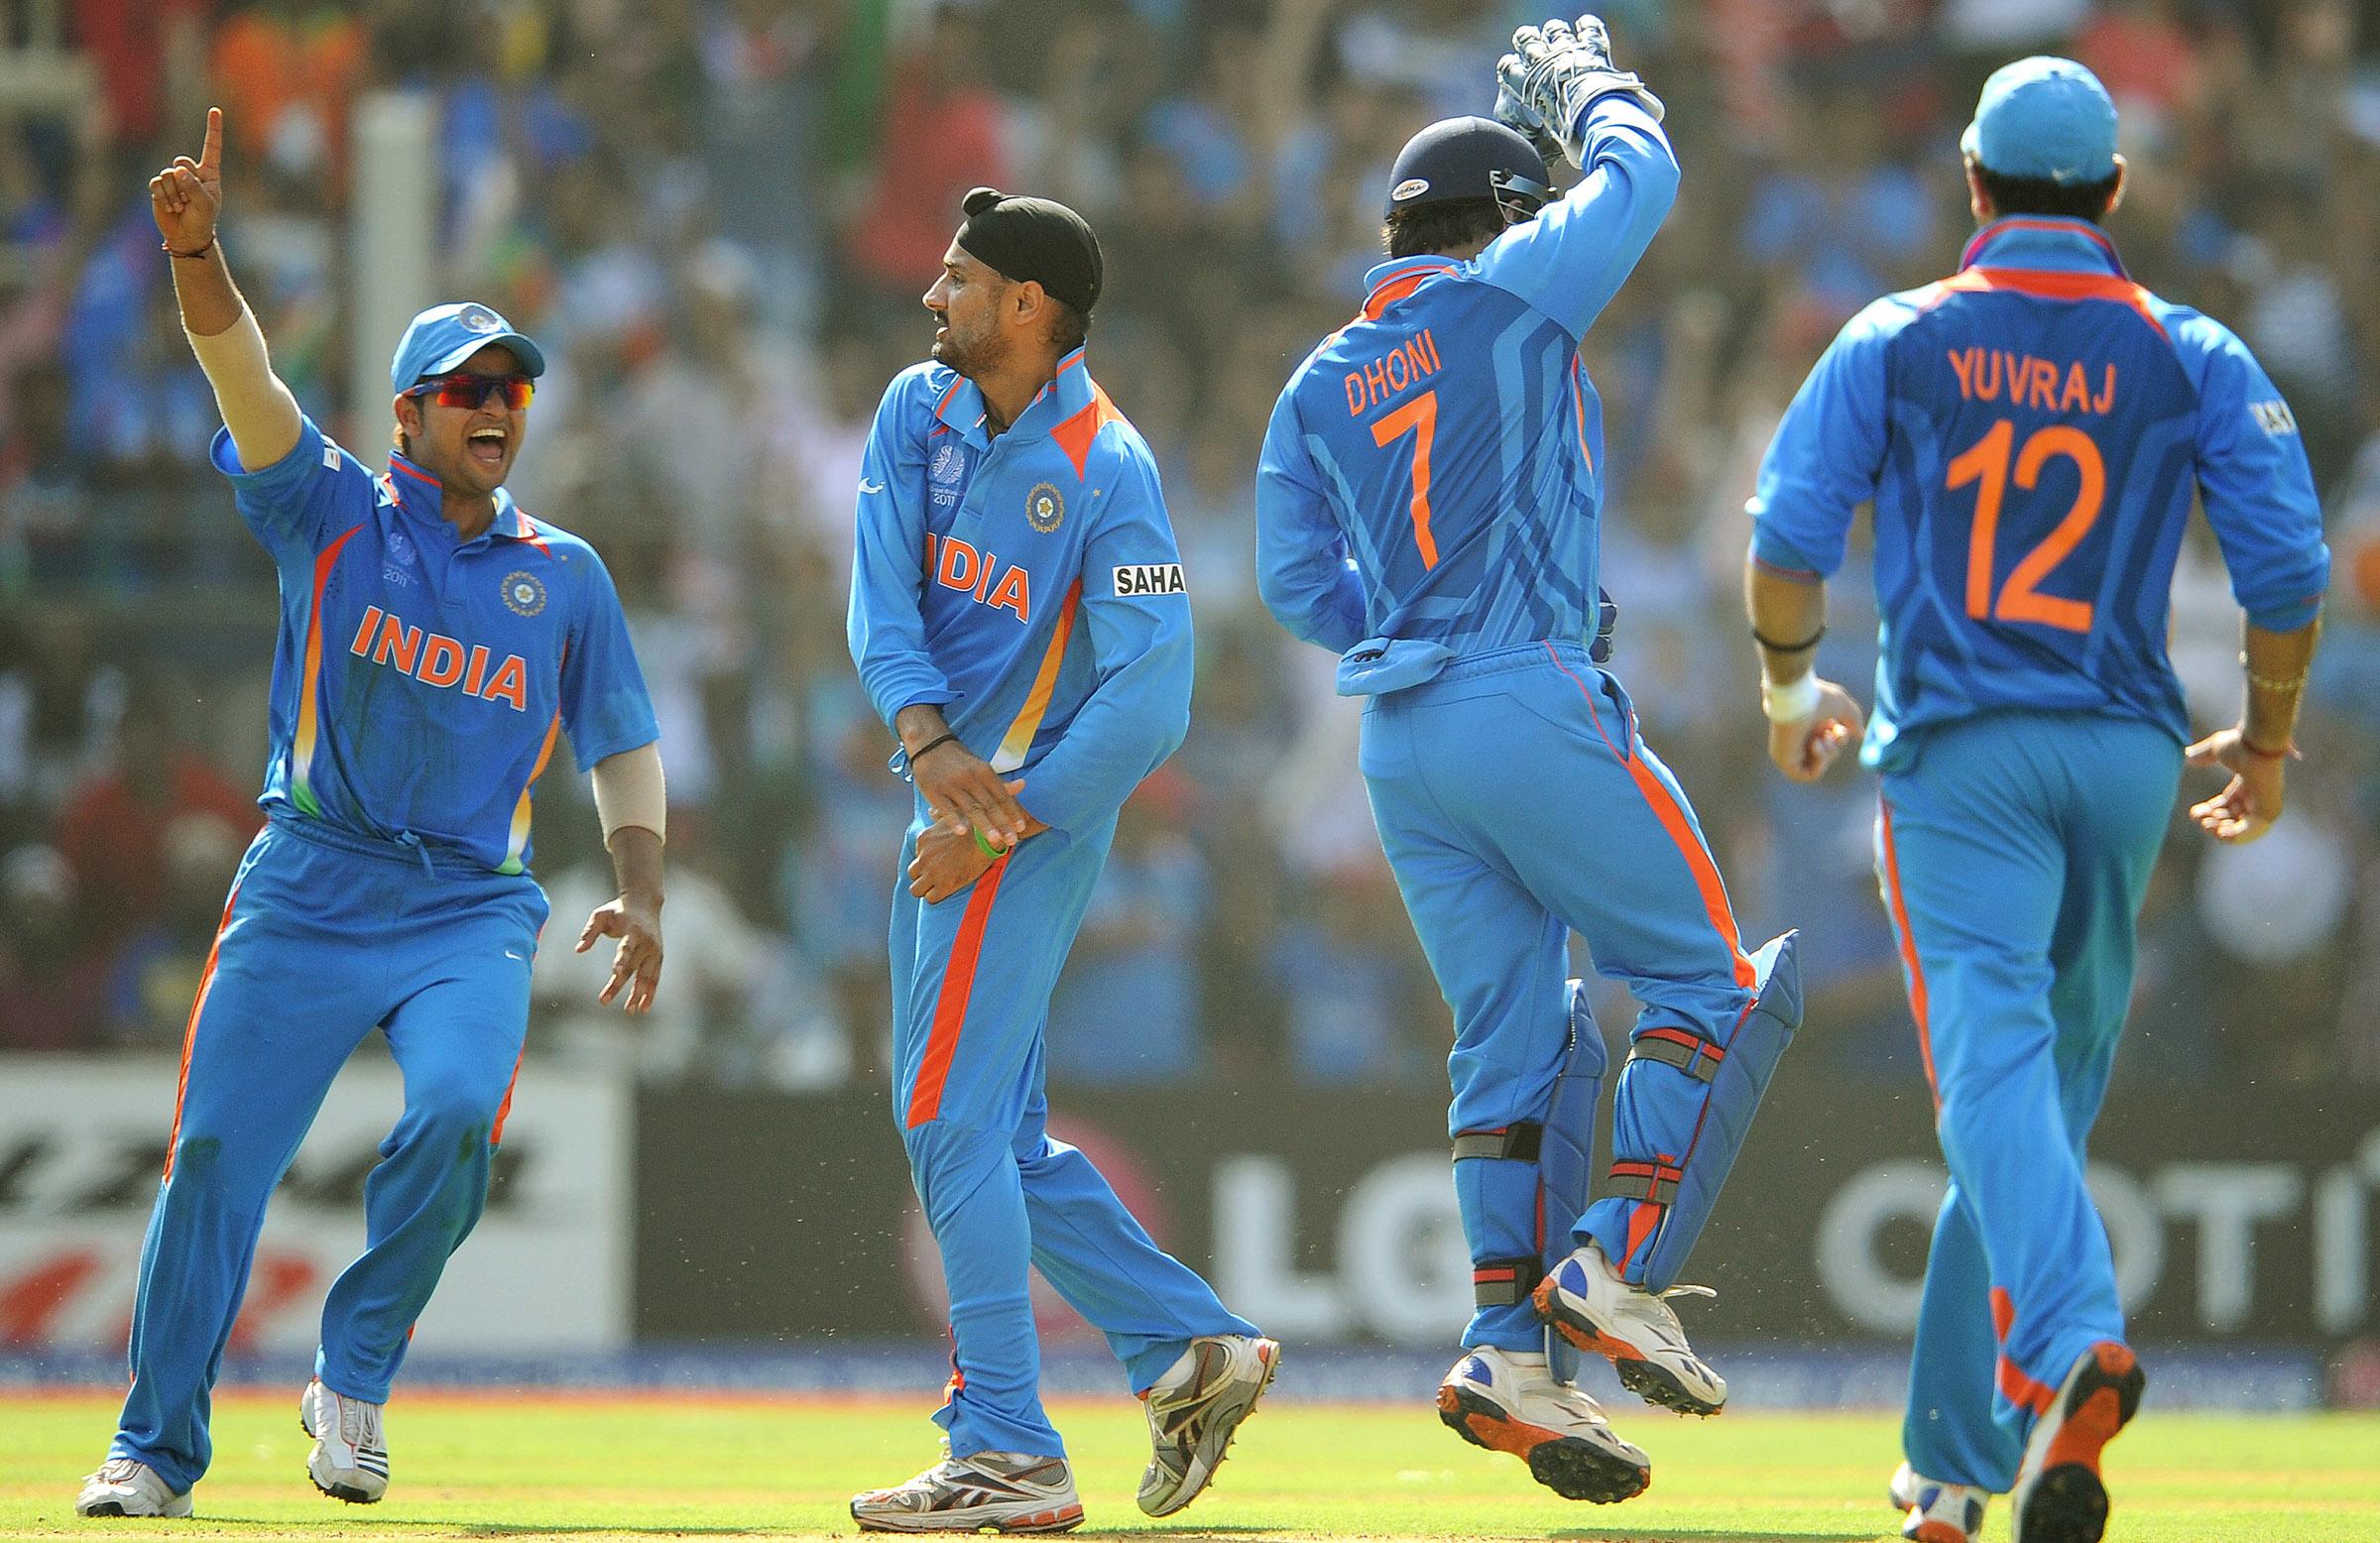 Raina, Harbhajan Singh, Dhoni and Yuvraj at the 2011 World Cup // Getty